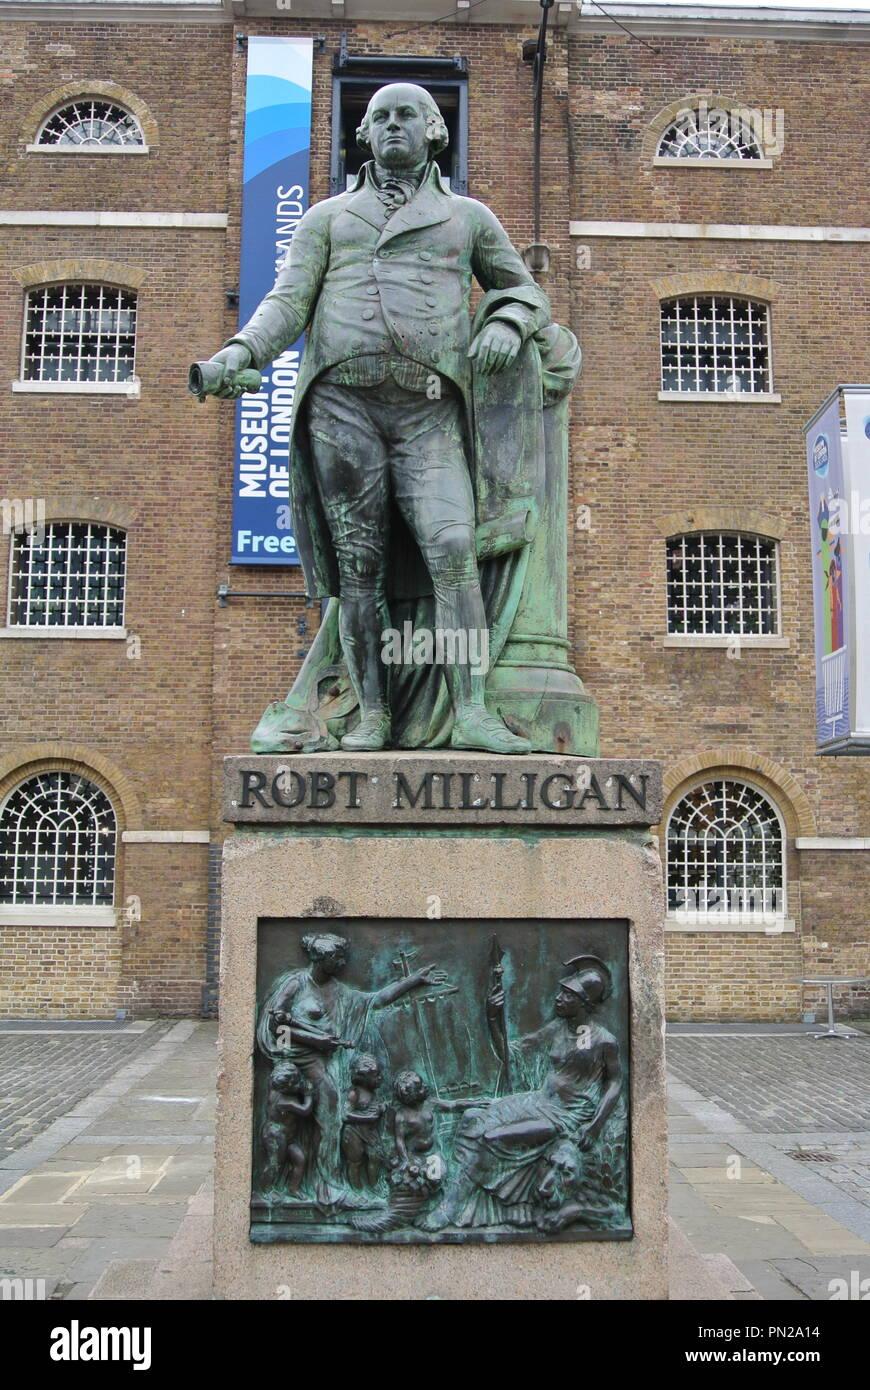 A Bronze Statue of Robert Milligan, West India Docks, London, England. UK. Stock Photo